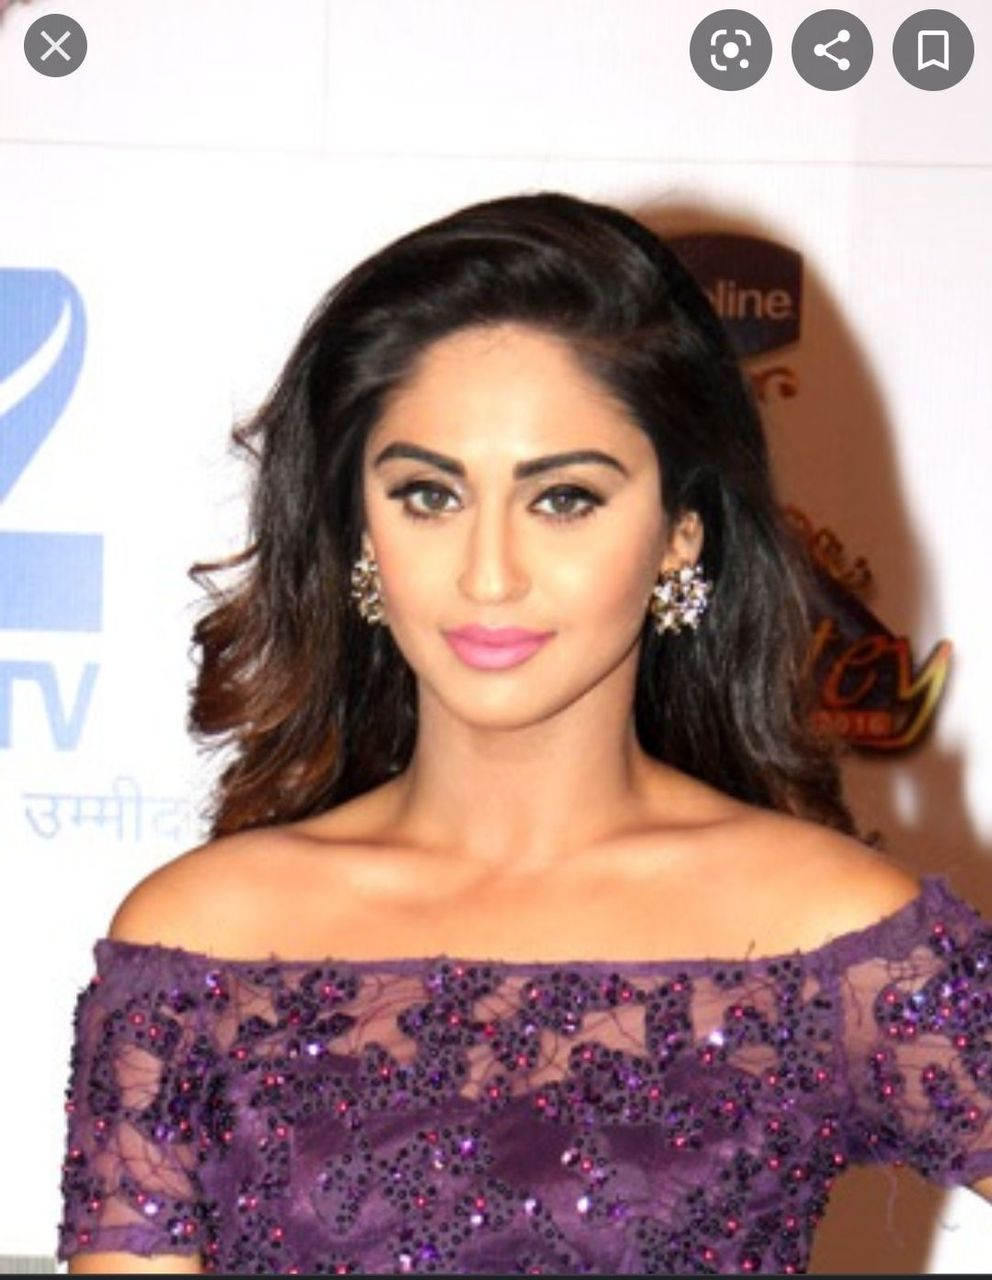 Samaira tanejaArymans sister,Riddhima bff has crush on Randheer